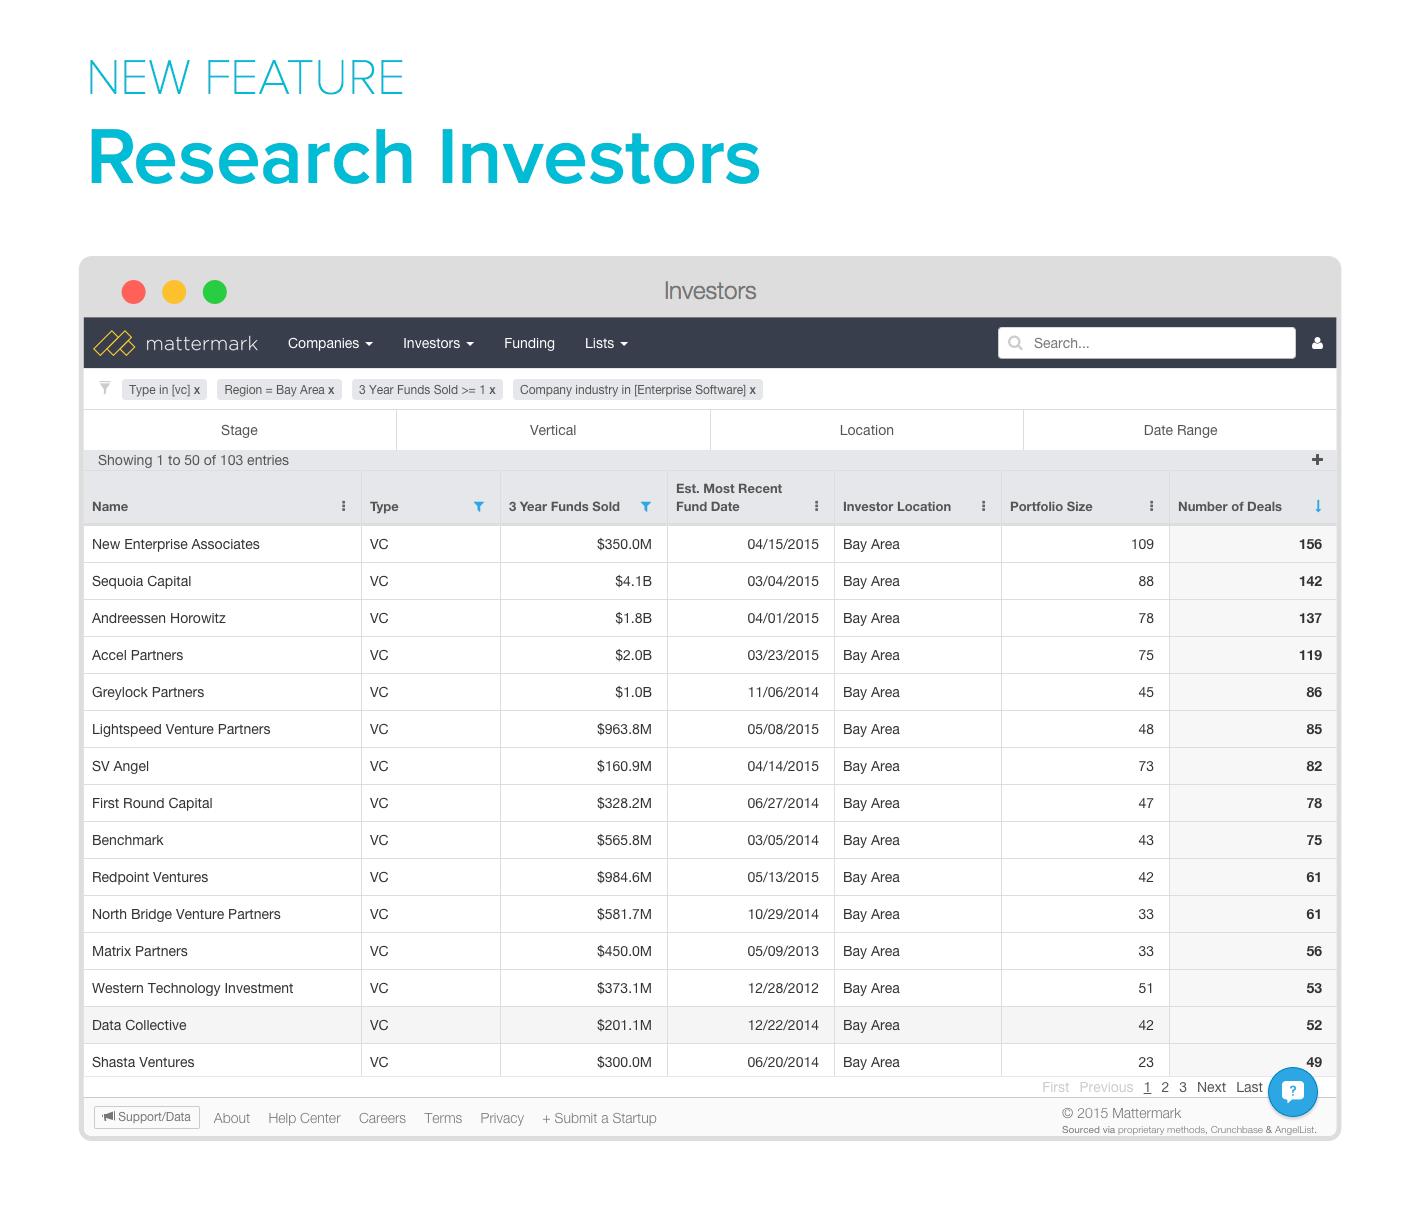 Research Investors